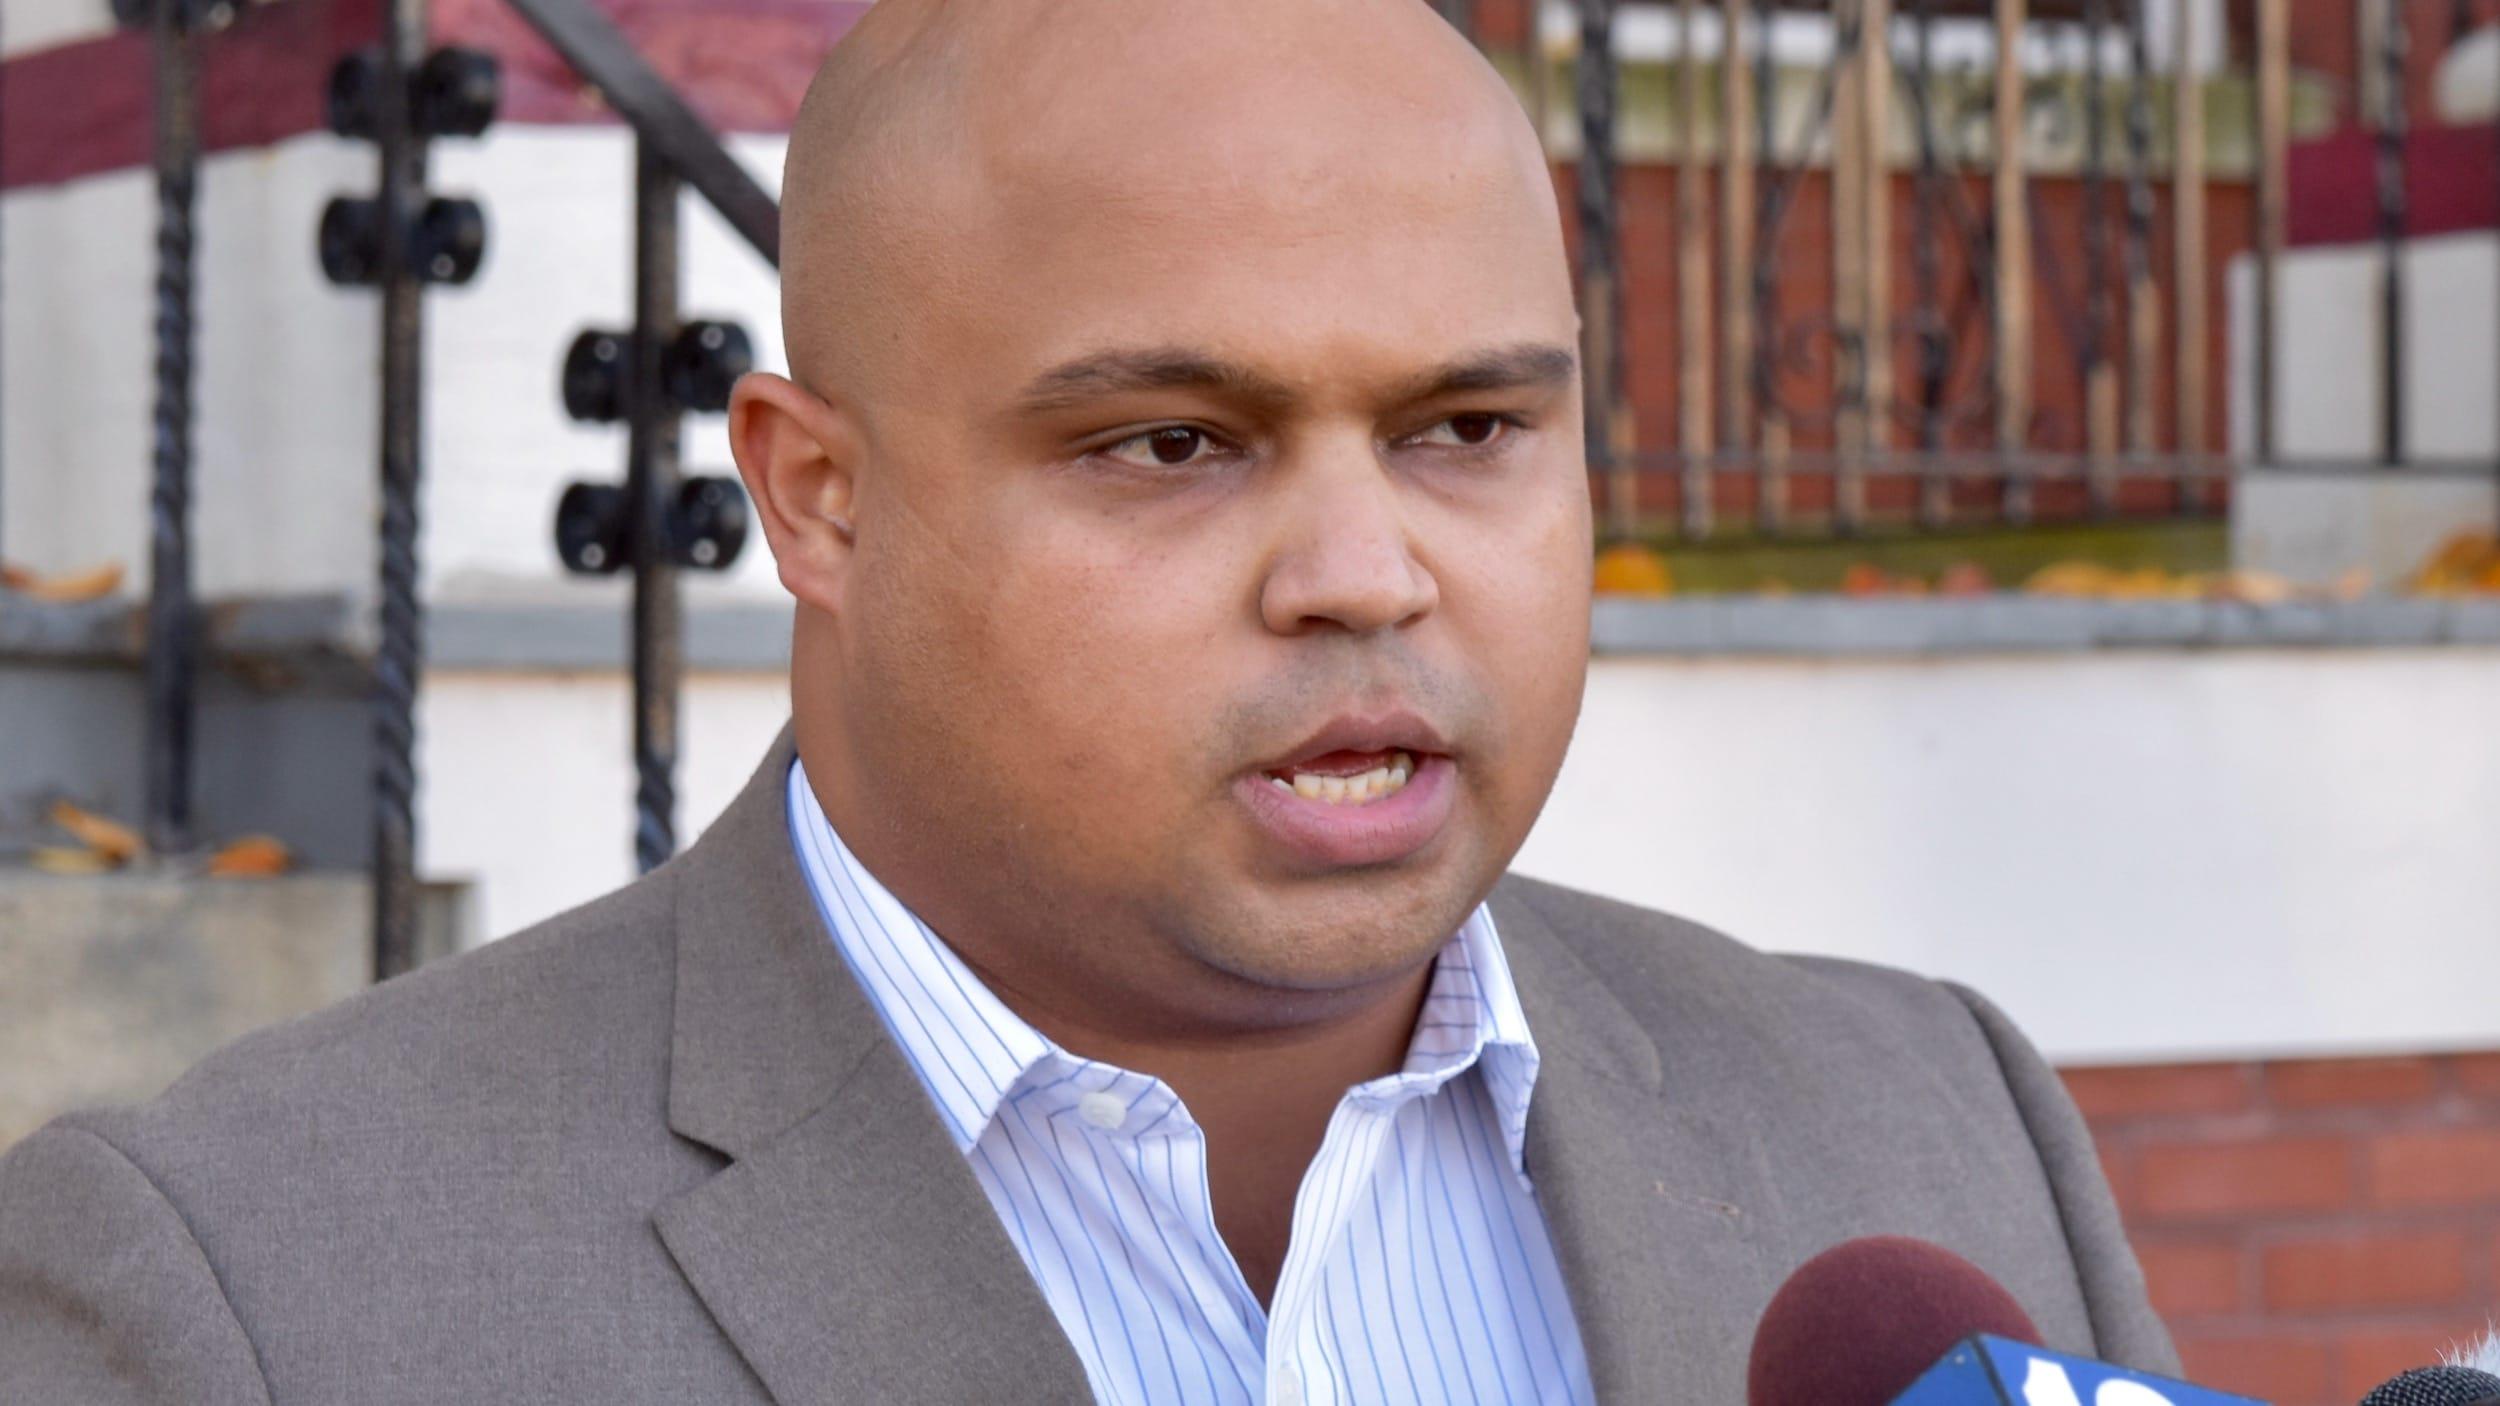 Photo for PERA Director Batista unilaterally releases Sgt Hanley video